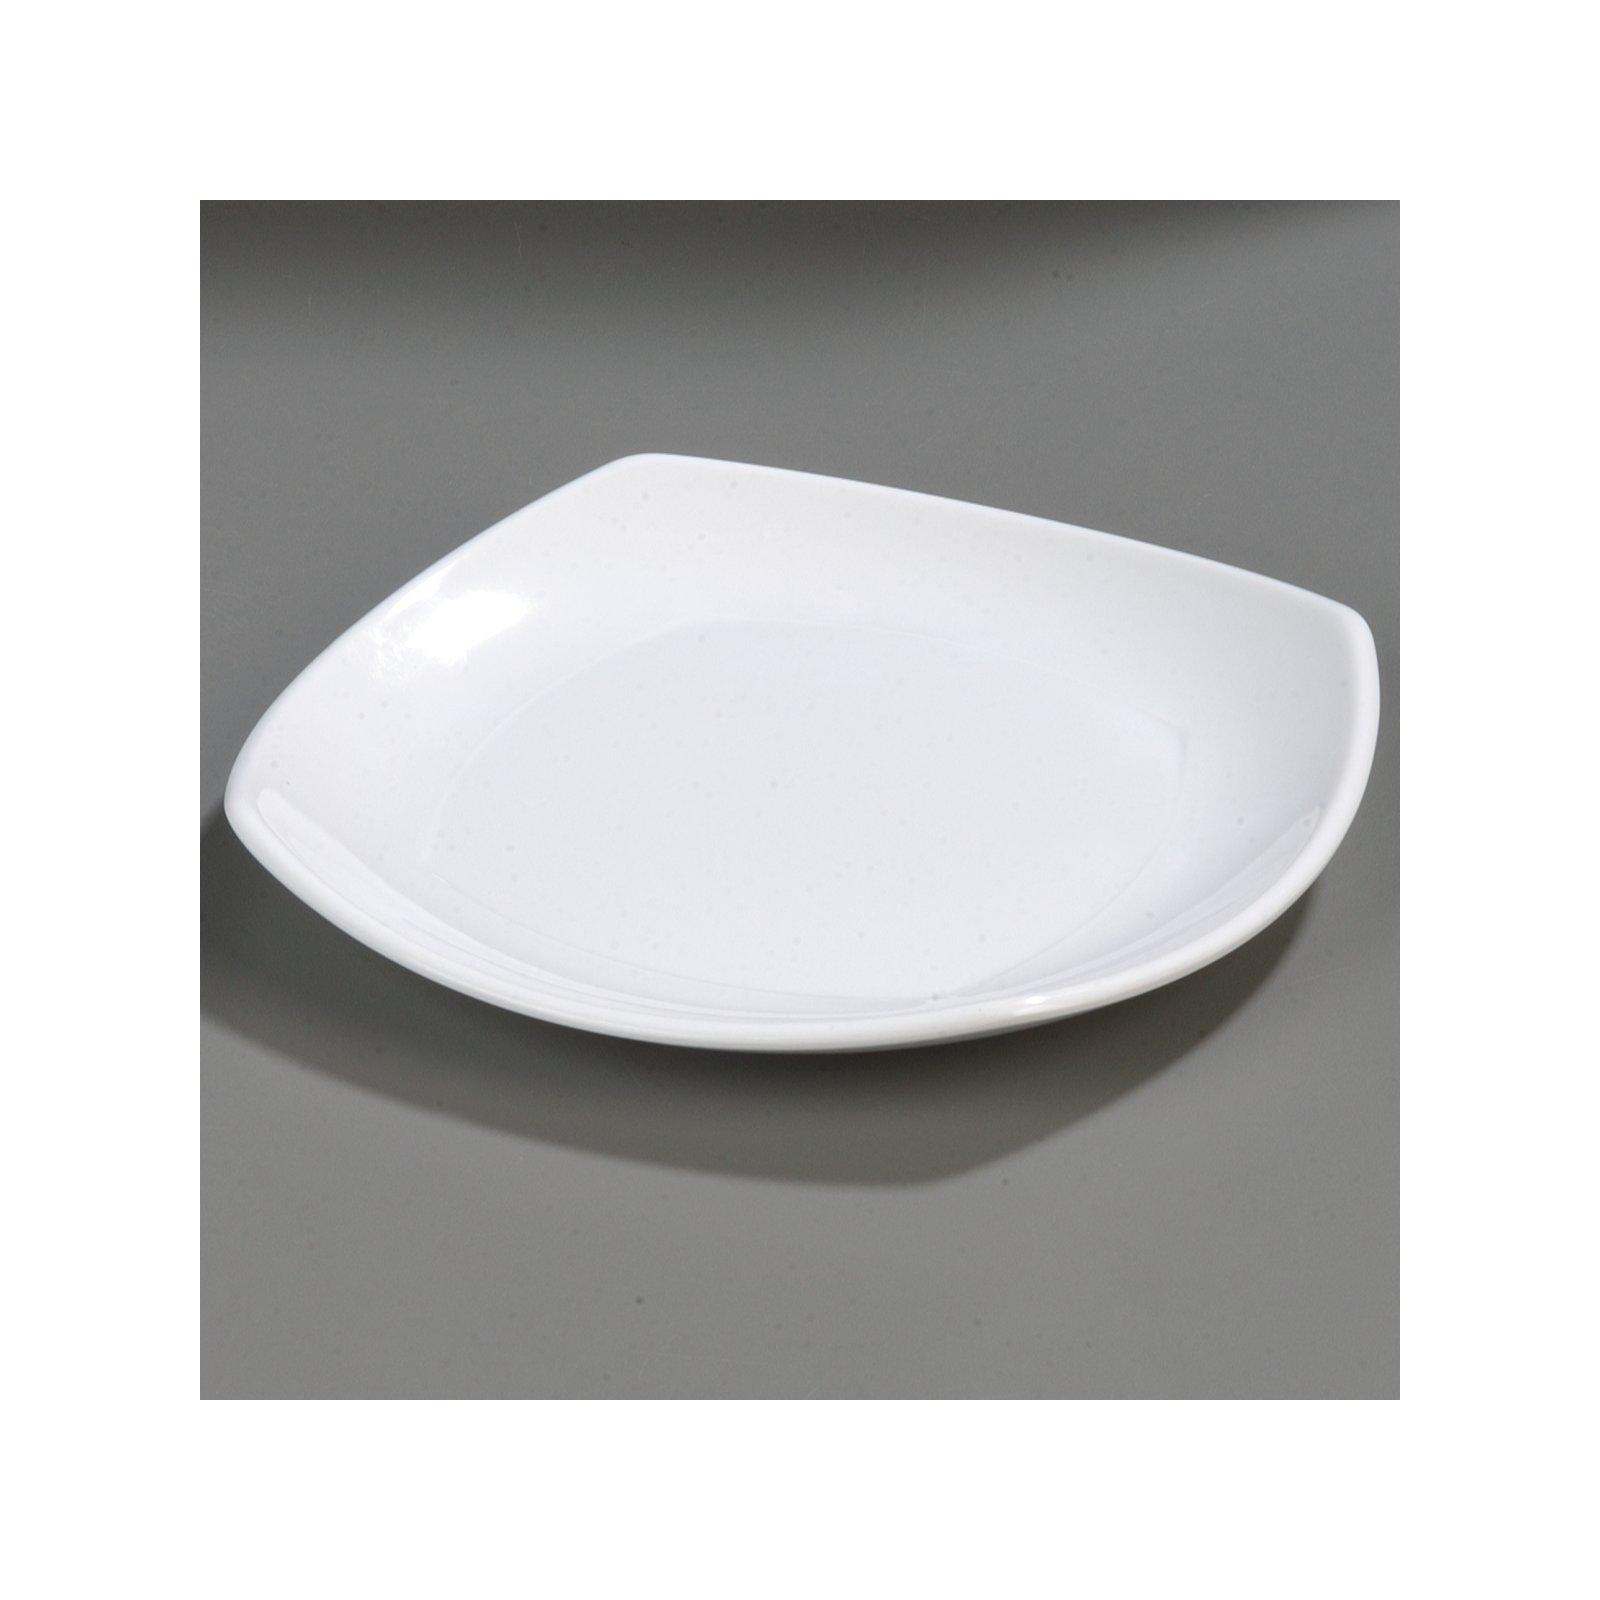 ... 4330602 - Melamine Upturned Corner Medium Square Plate 9.5\  - White  sc 1 st  Carlisle FoodService Products & 4330602 - Melamine Upturned Corner Medium Square Plate 9.5\